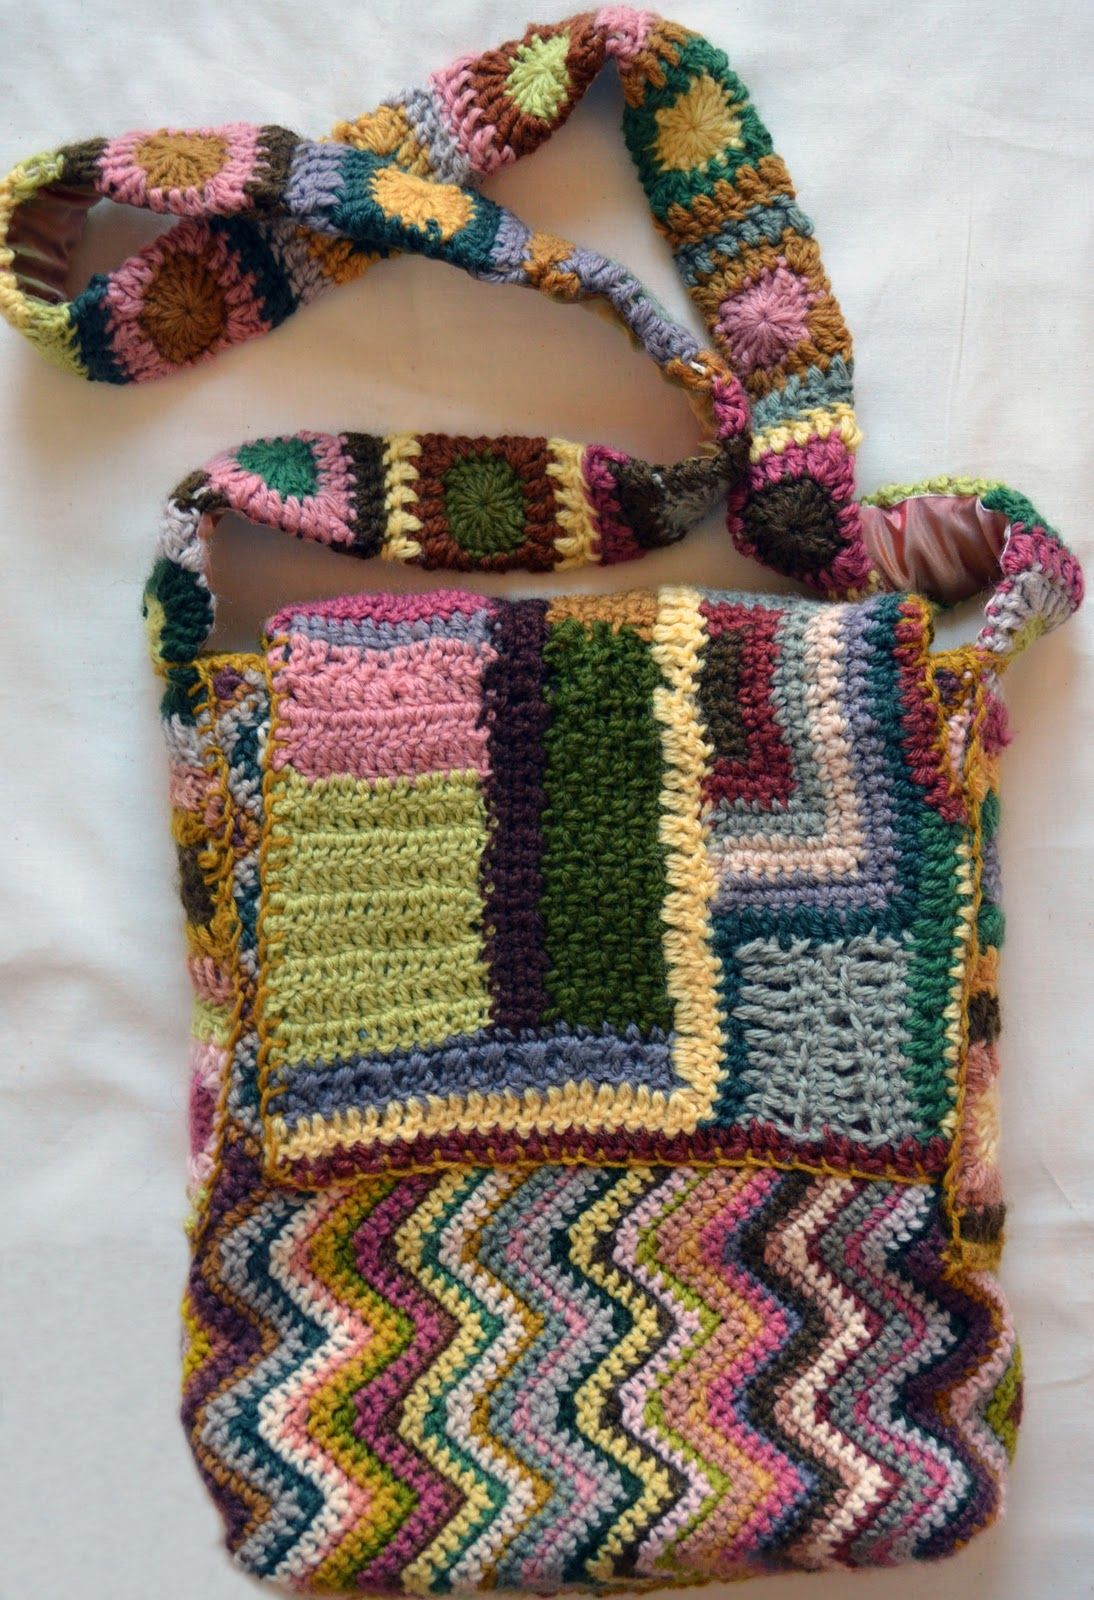 Crafting With Style Crocheted Zig Zag u Freeform Bag Crosetat